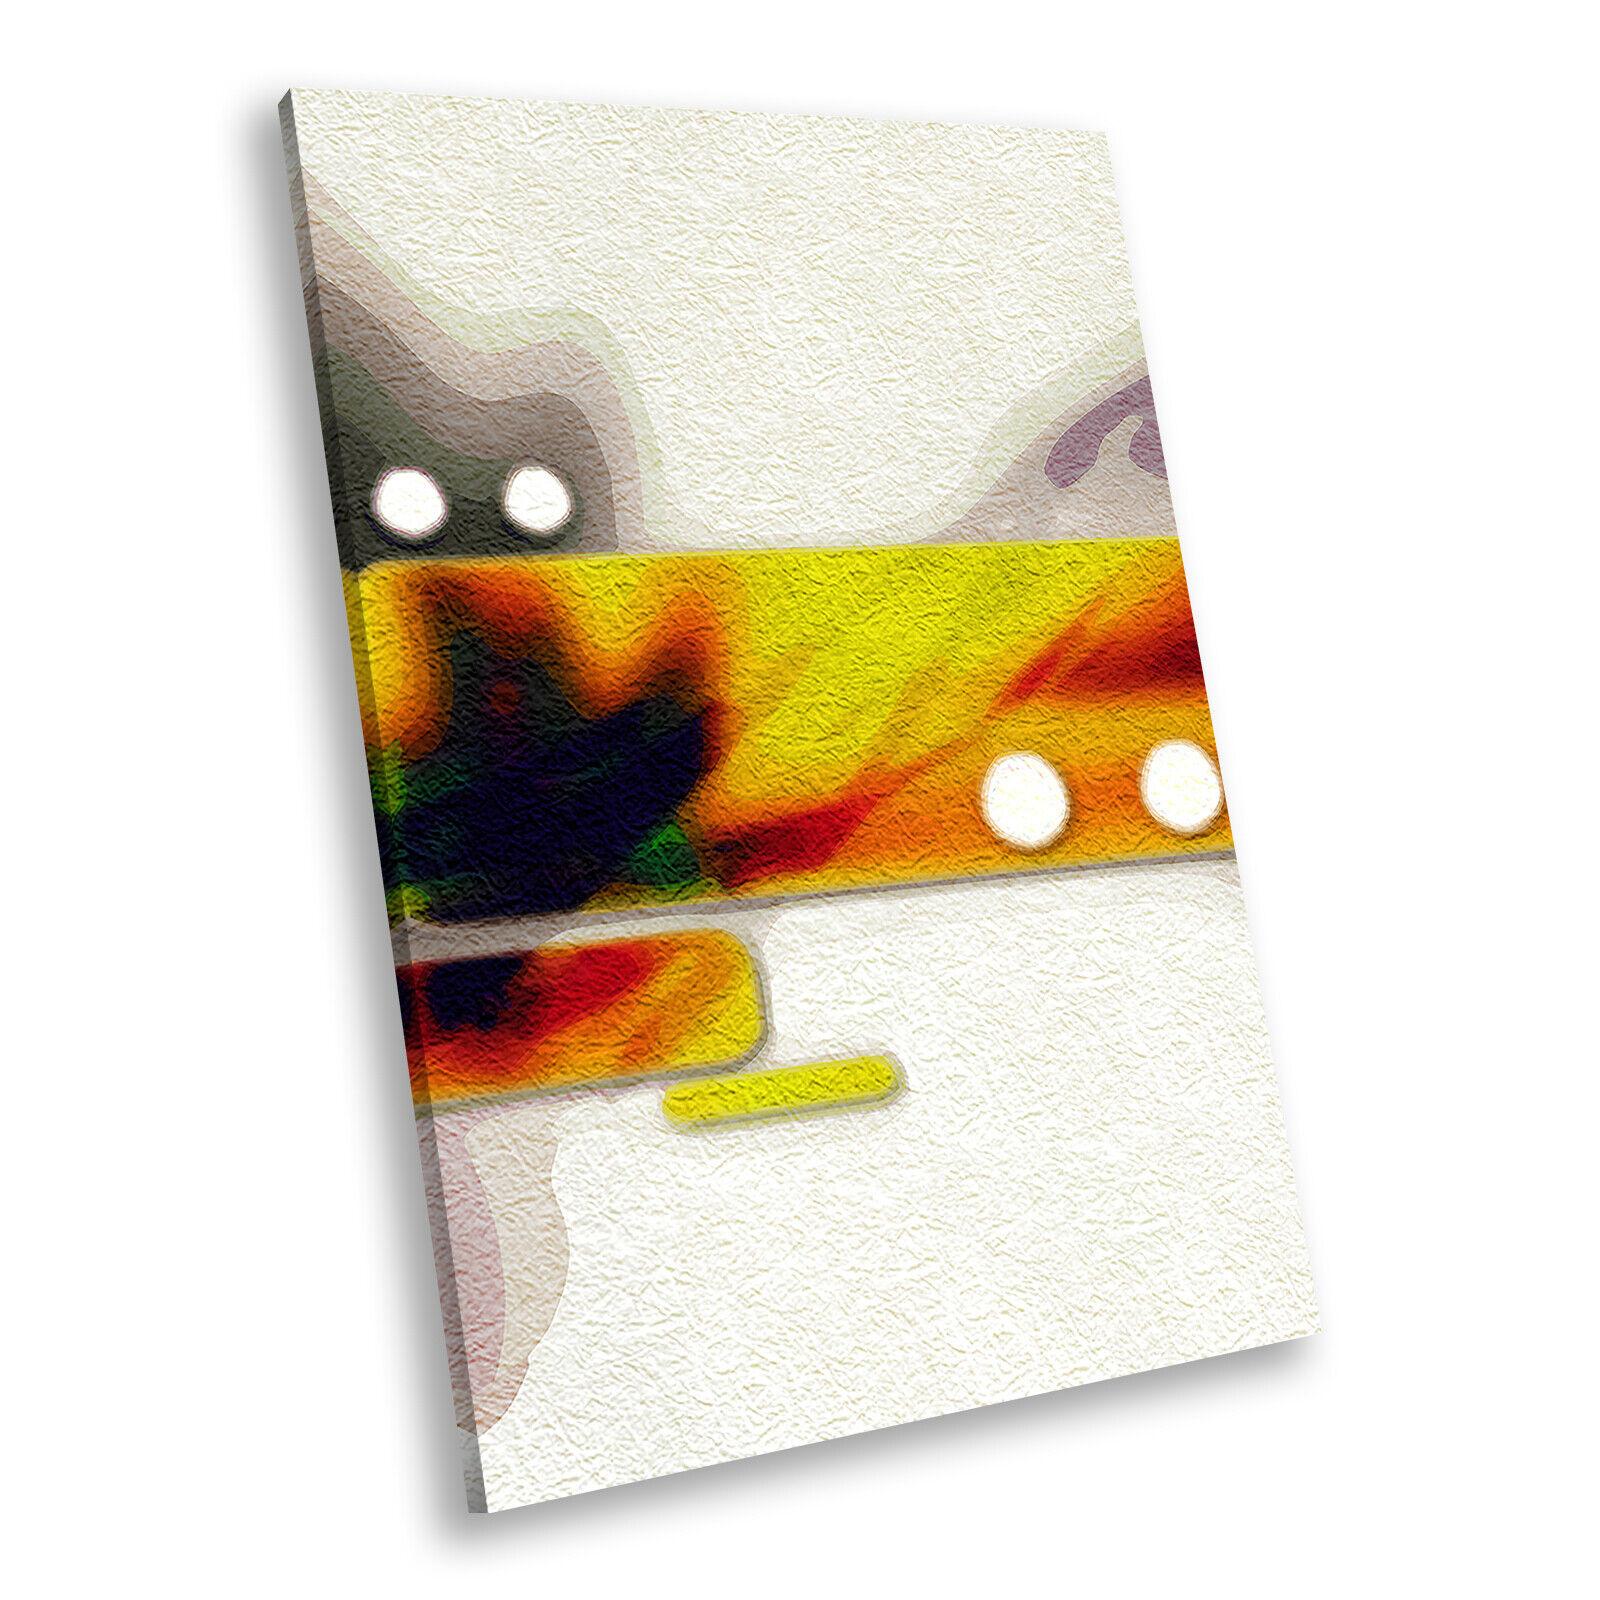 Orange grau lila Portrait Abstract Canvas Framed Art Large Picture